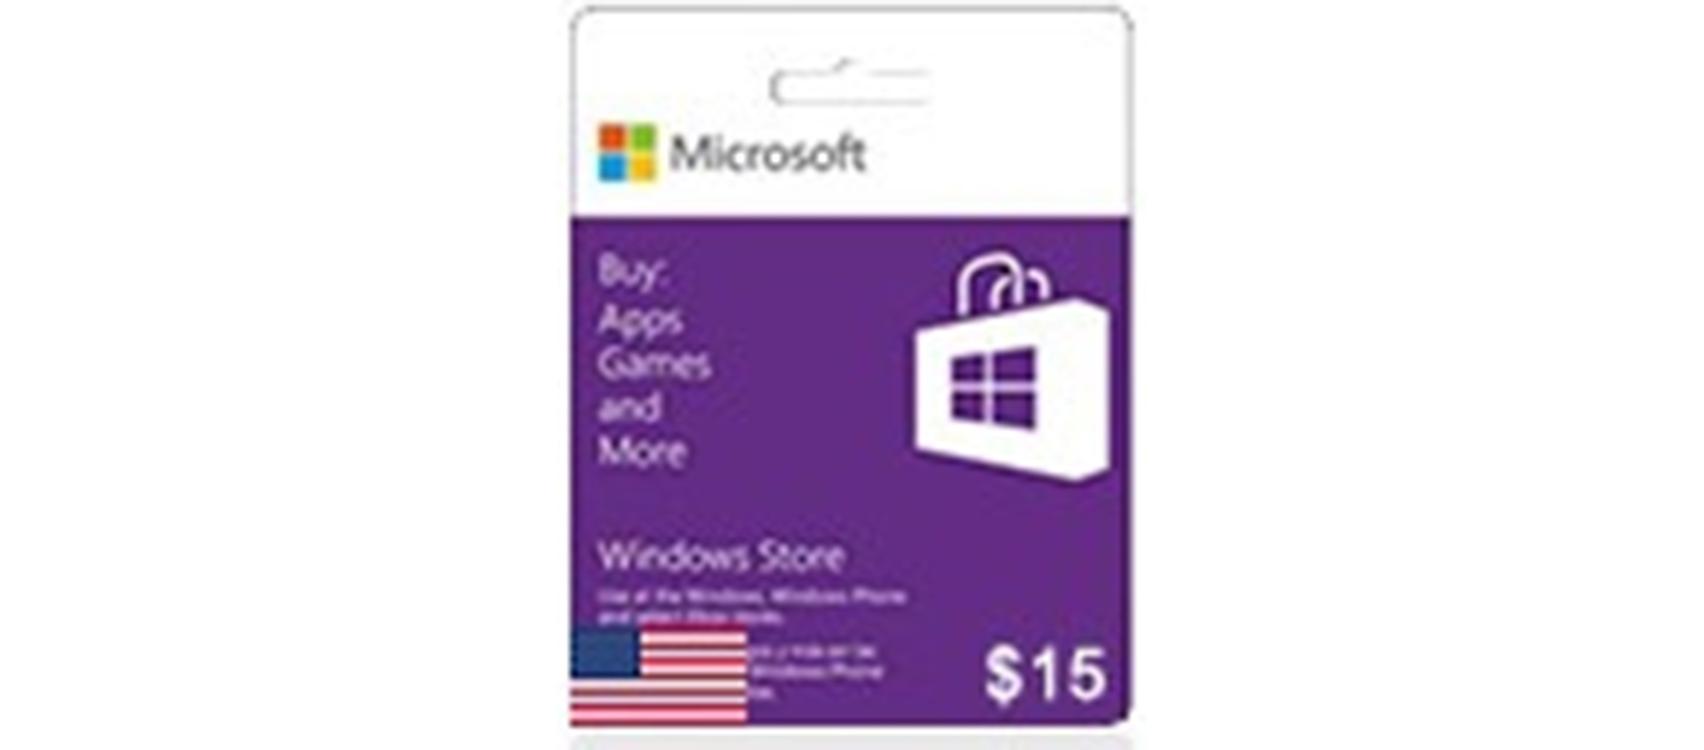 Windows Phone Store Gift Card  (US) 15$  (lg)